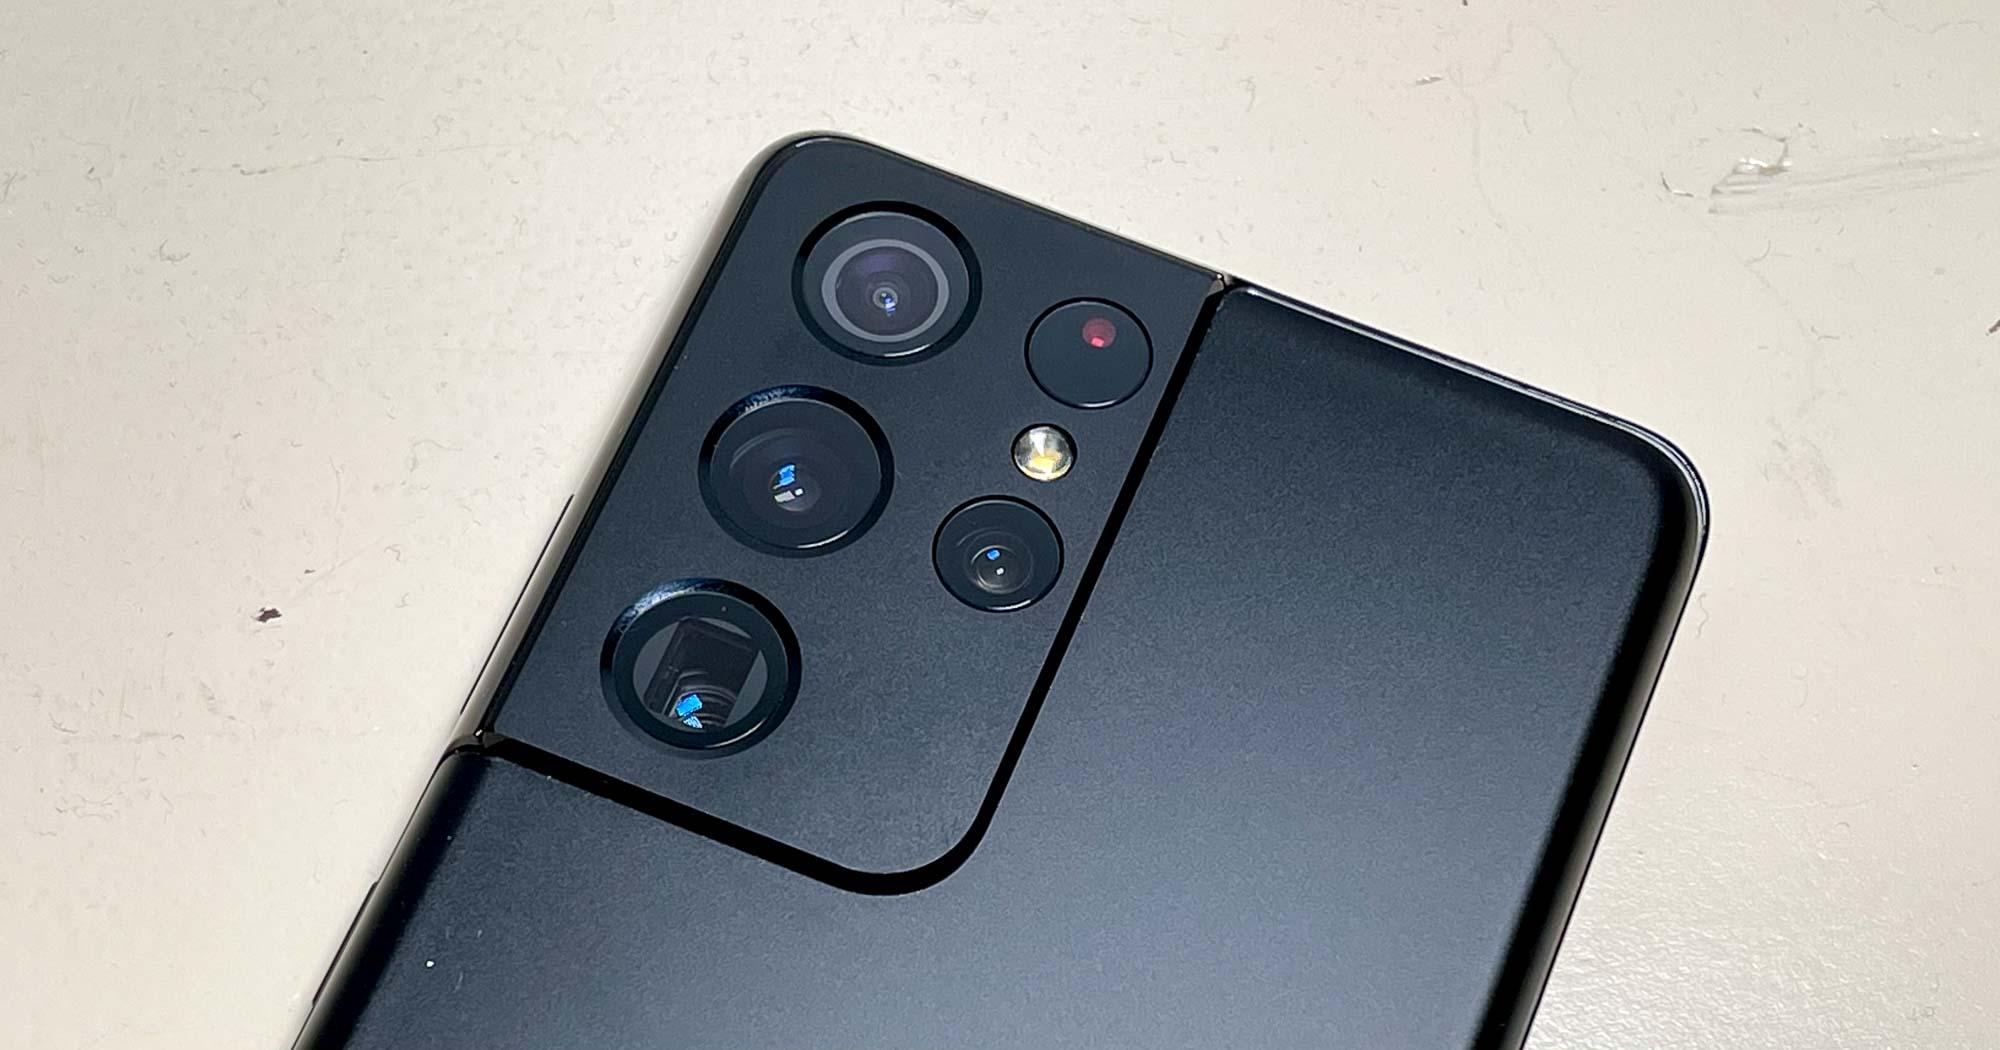 Samsung Galaxy S21 Ultra cameras